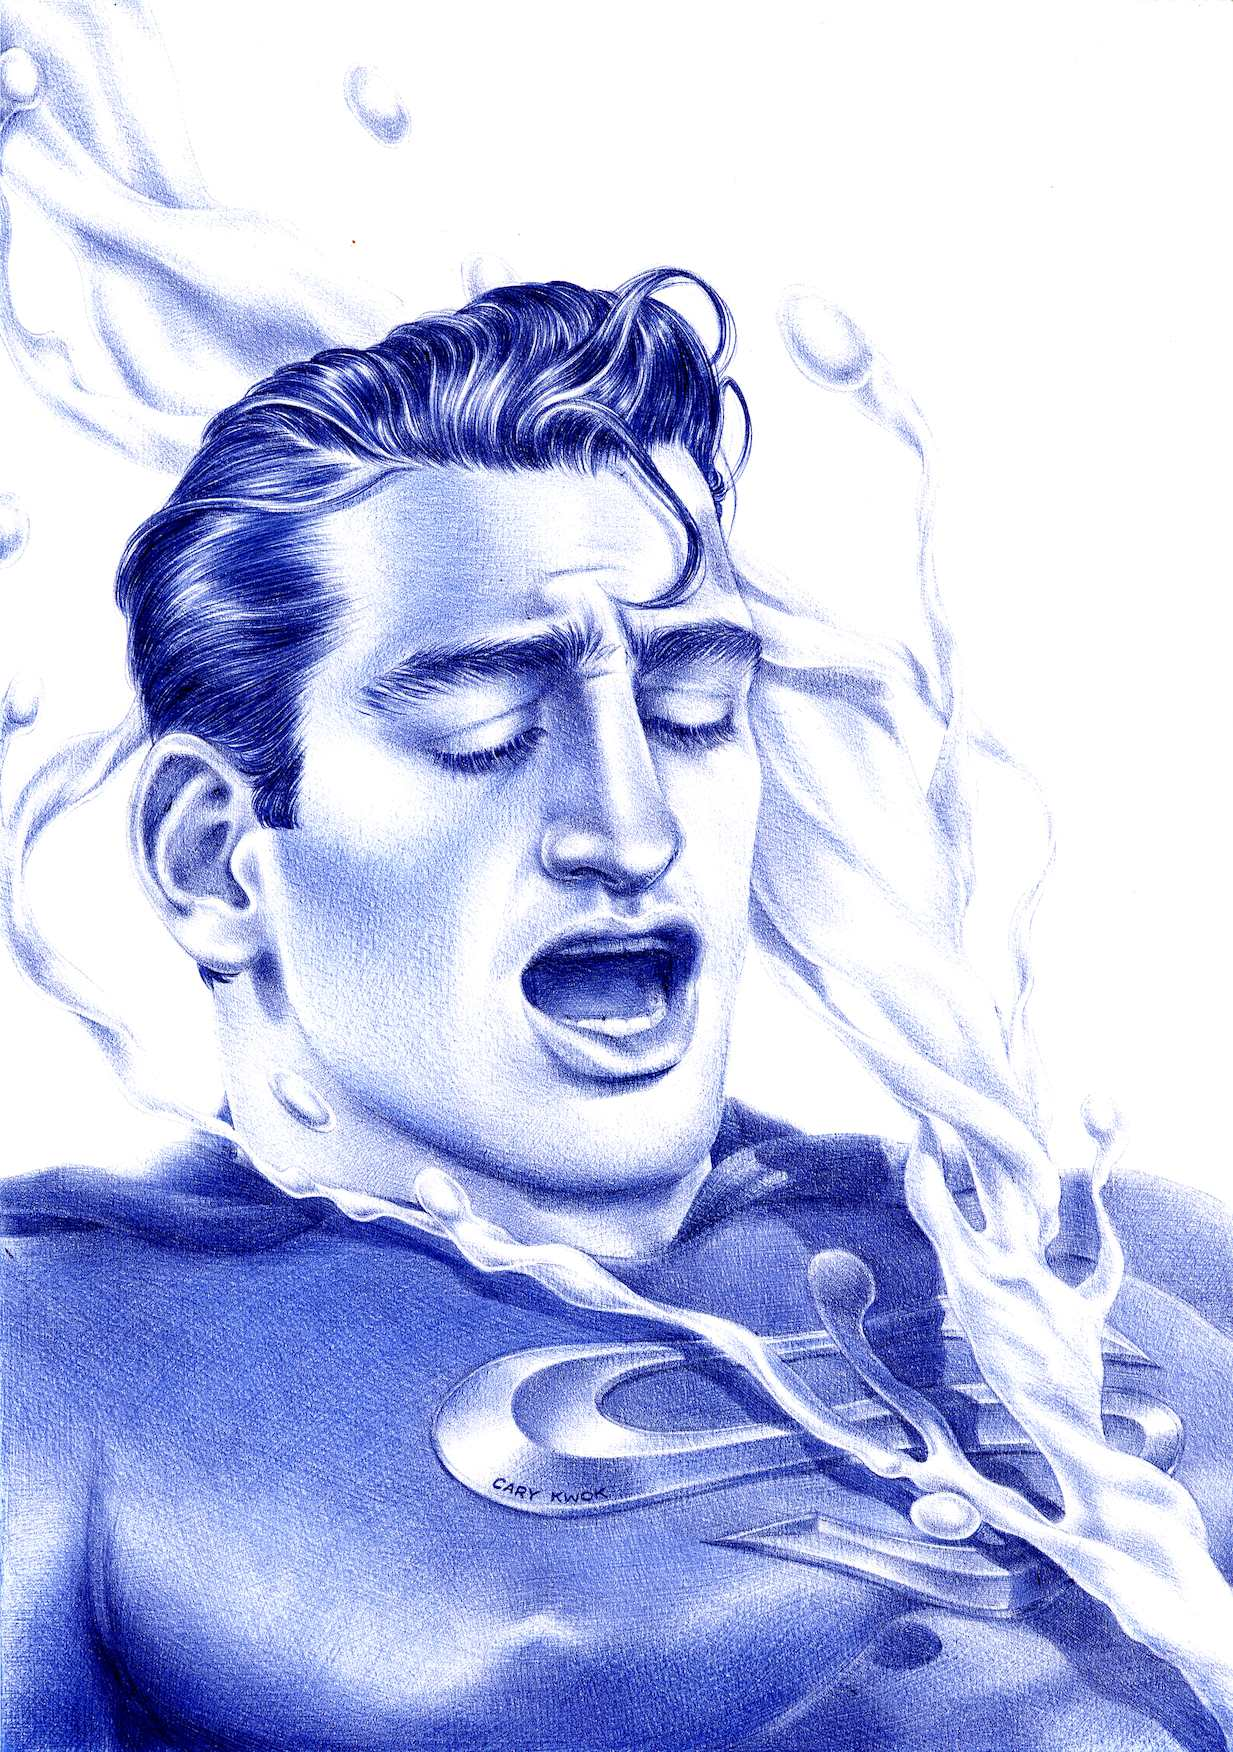 Sperman   2006   Ink on Paper   29.7 x 21 cm